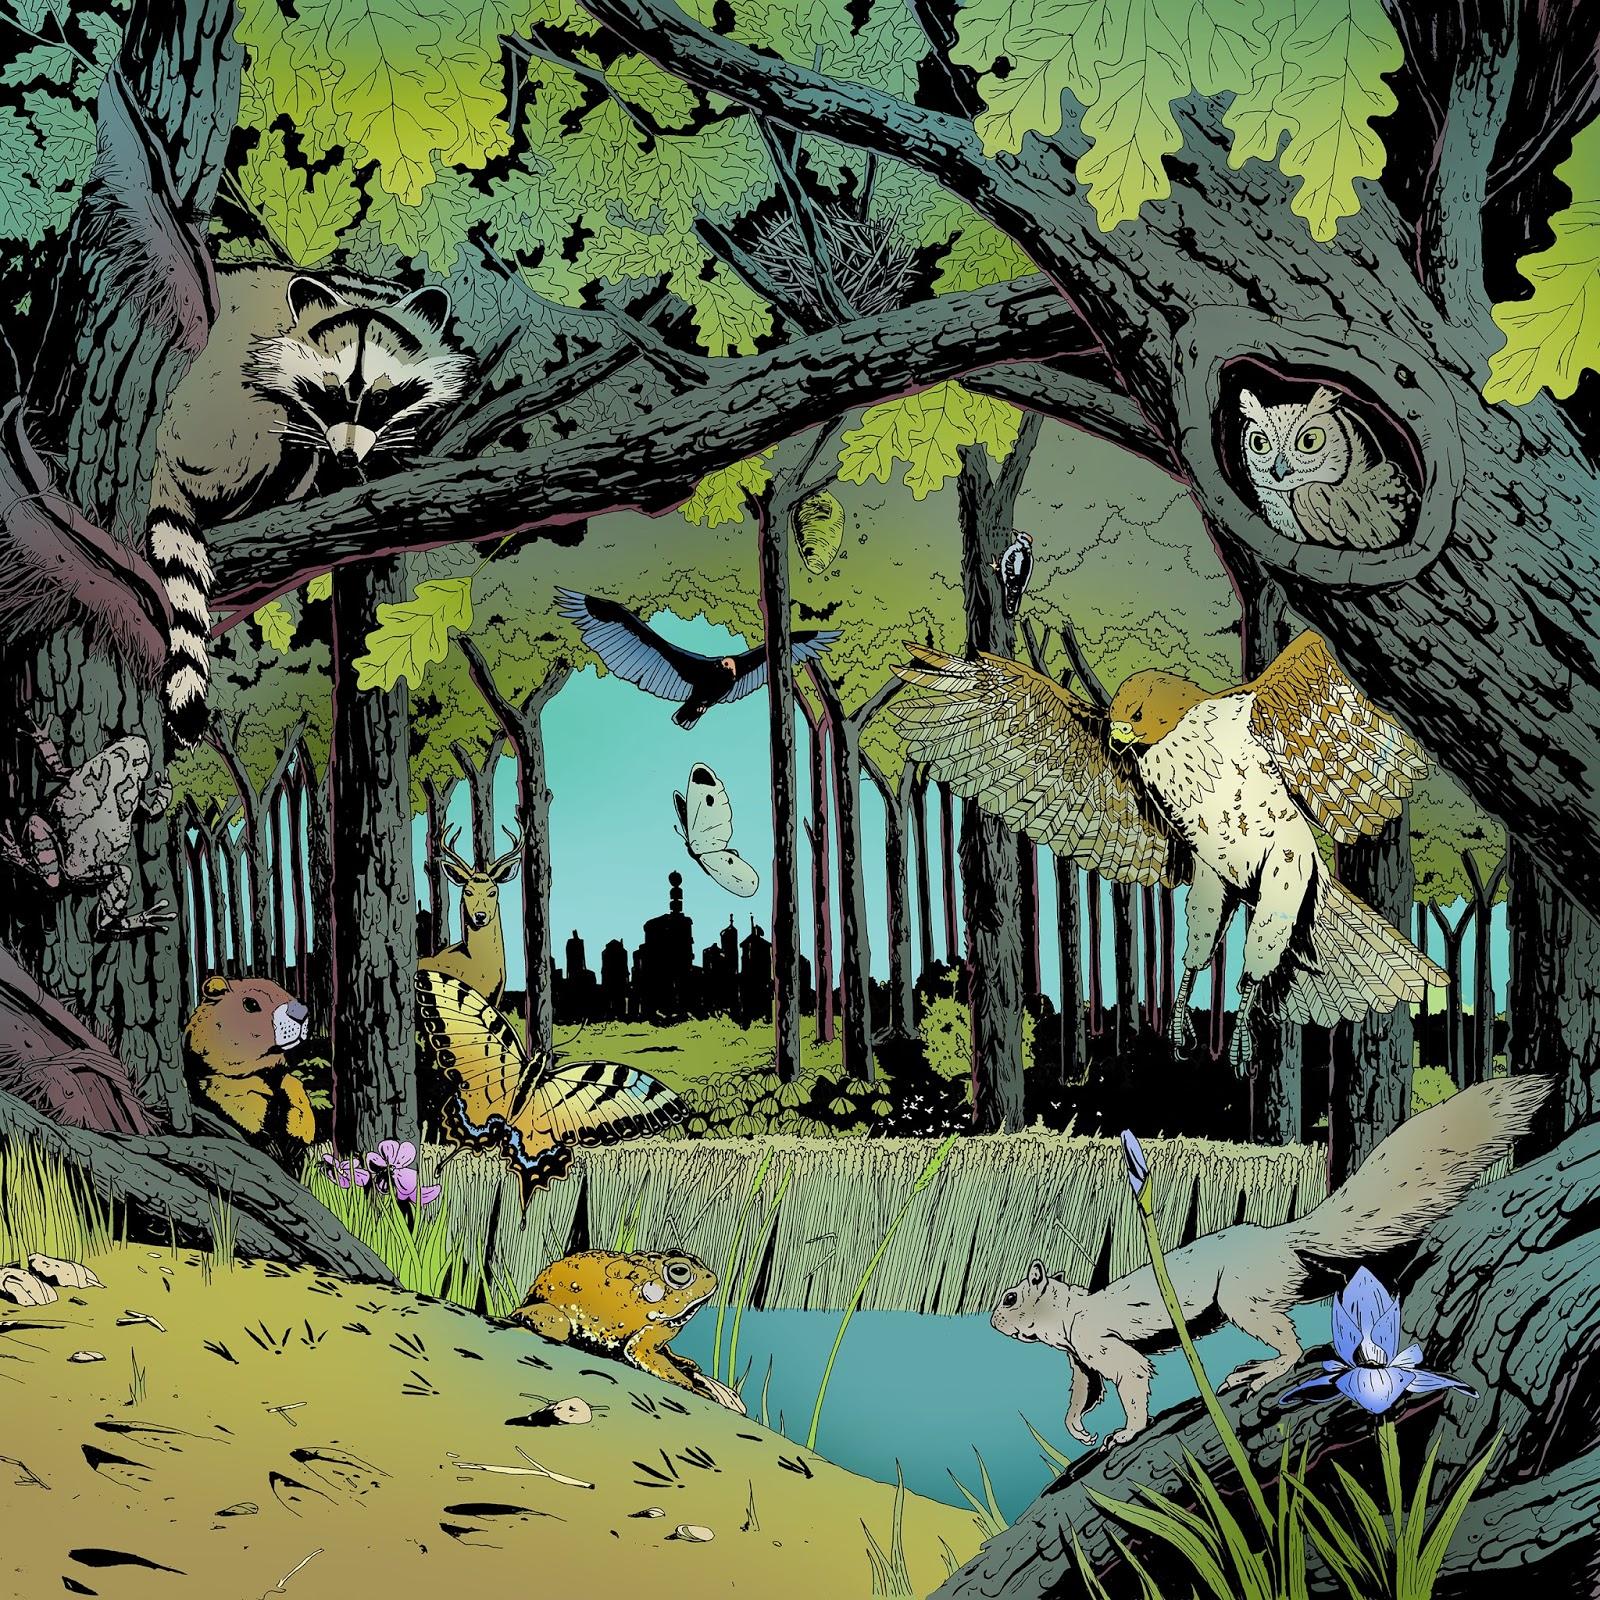 Forest Illustration – Mended Arrow